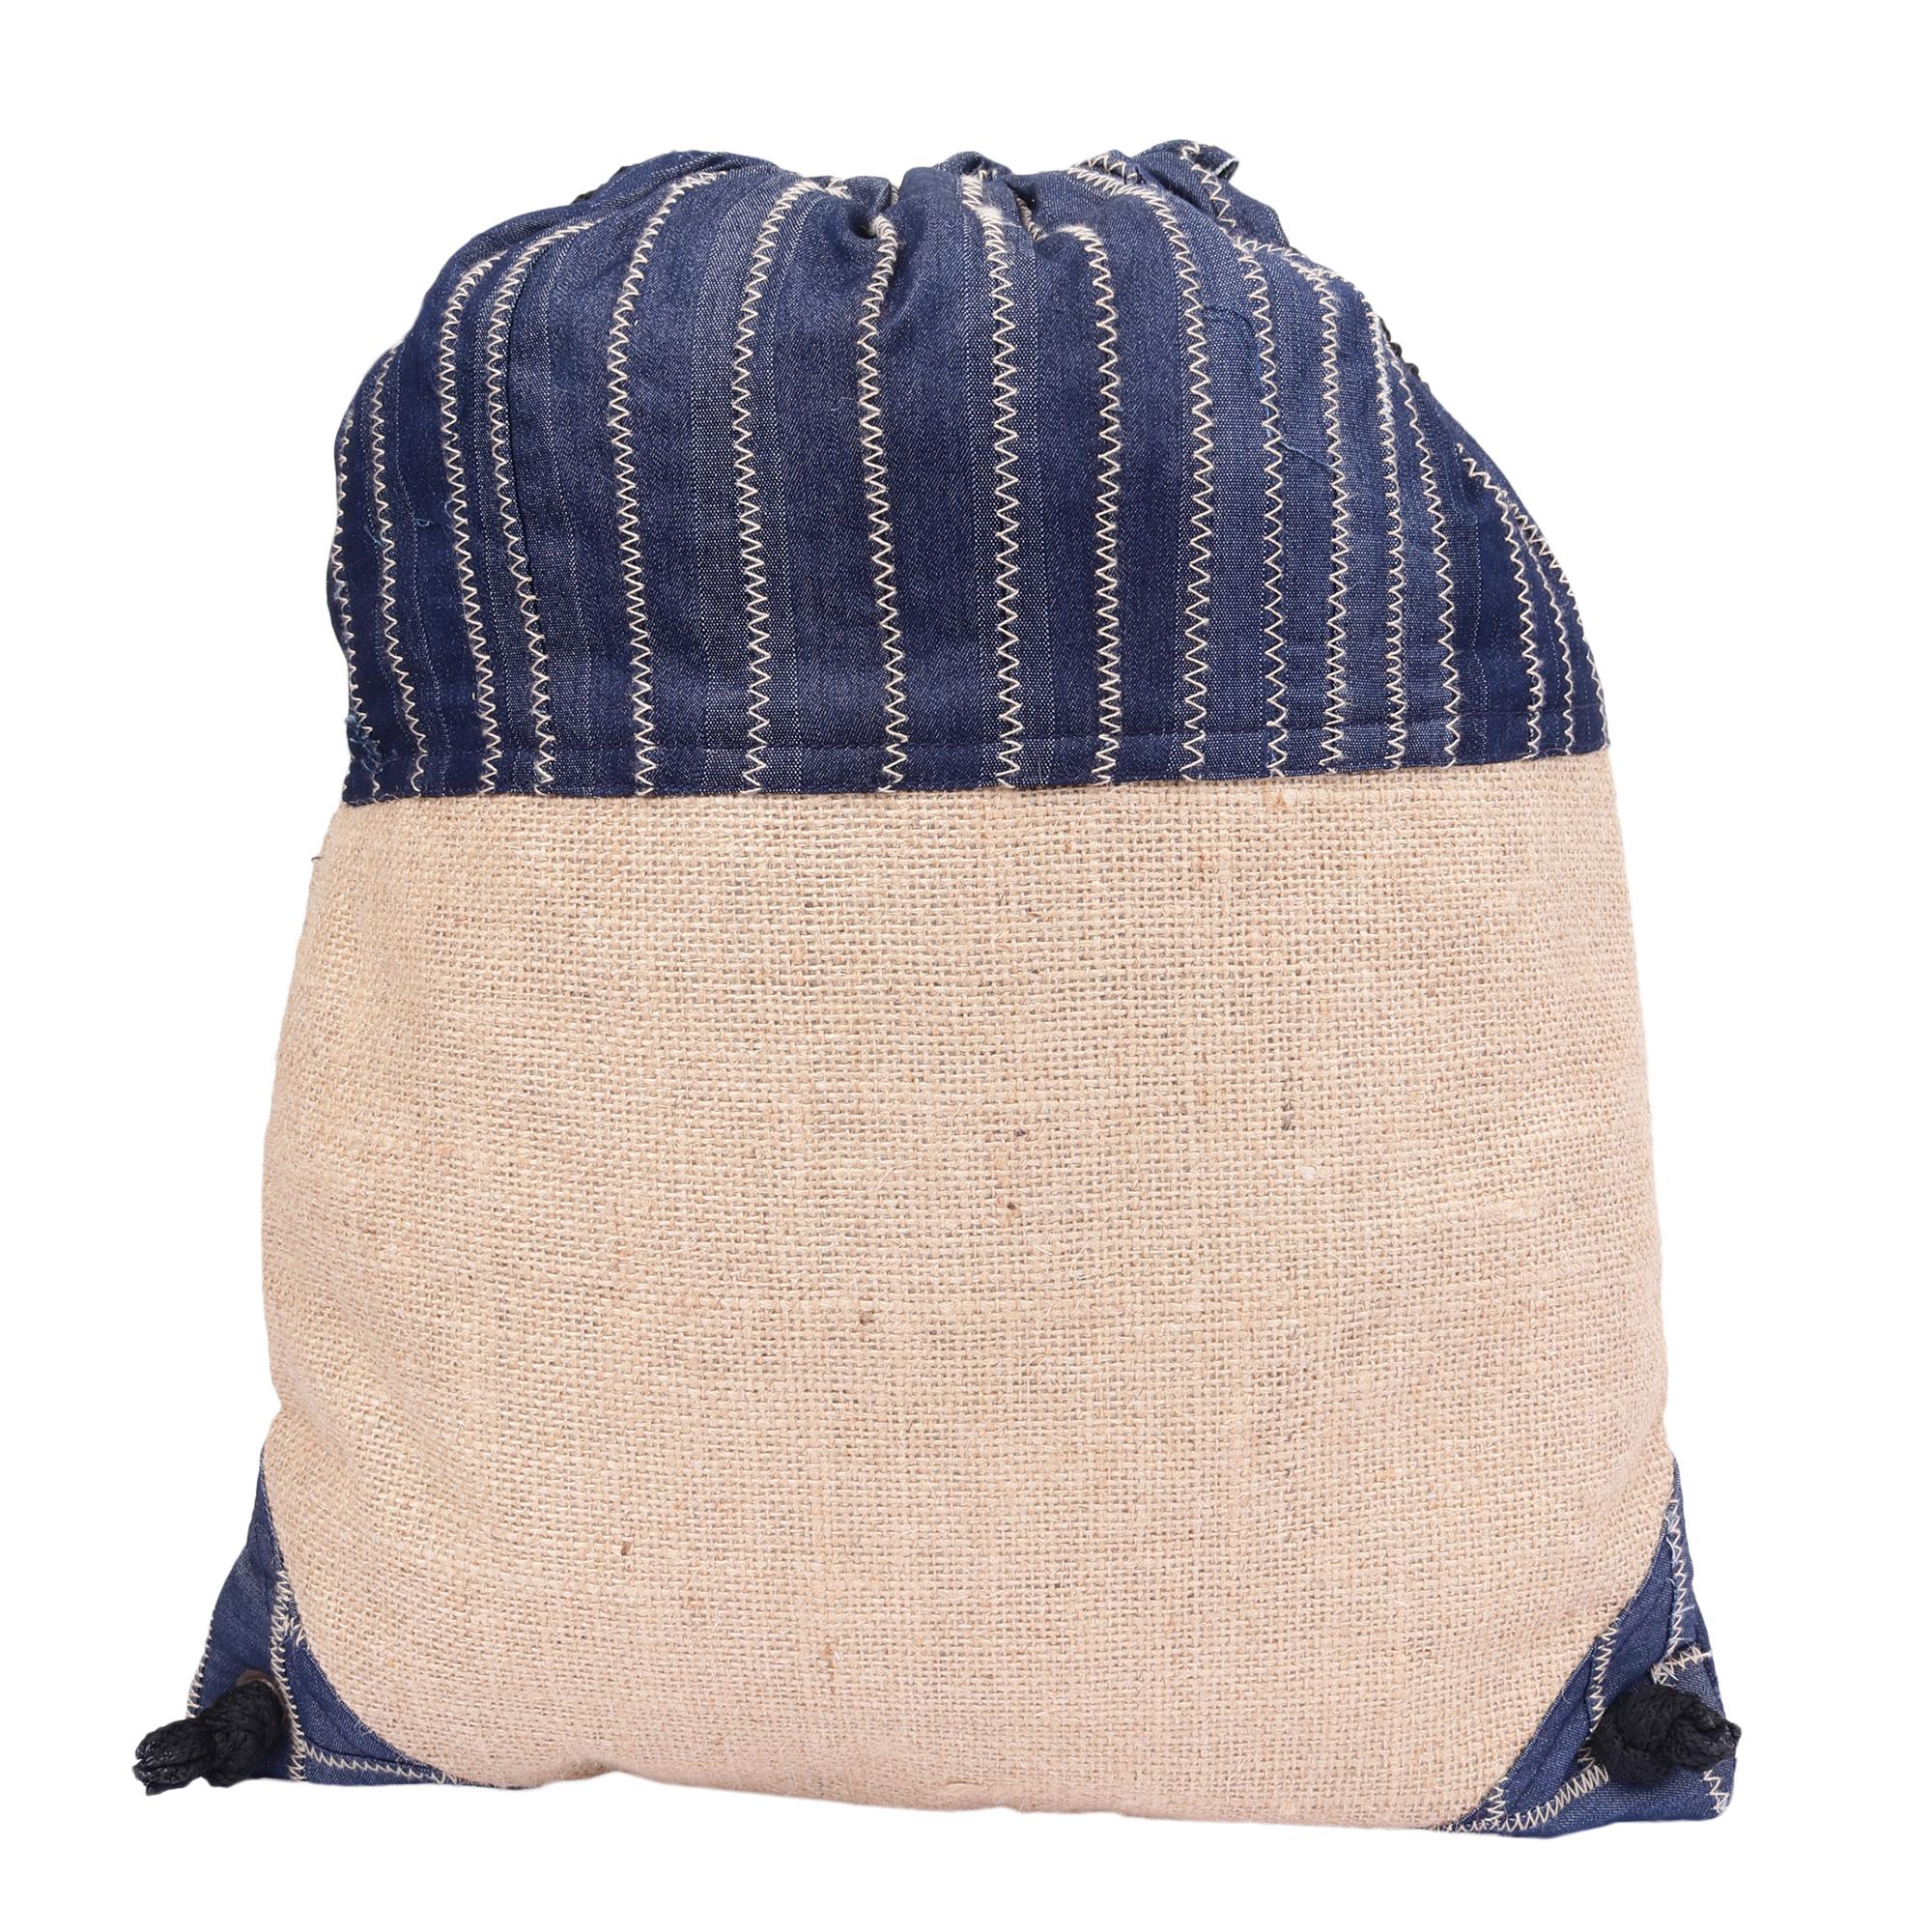 c89923e3d361 Brown Colour Jute Drawstring Bag for Boys/Men